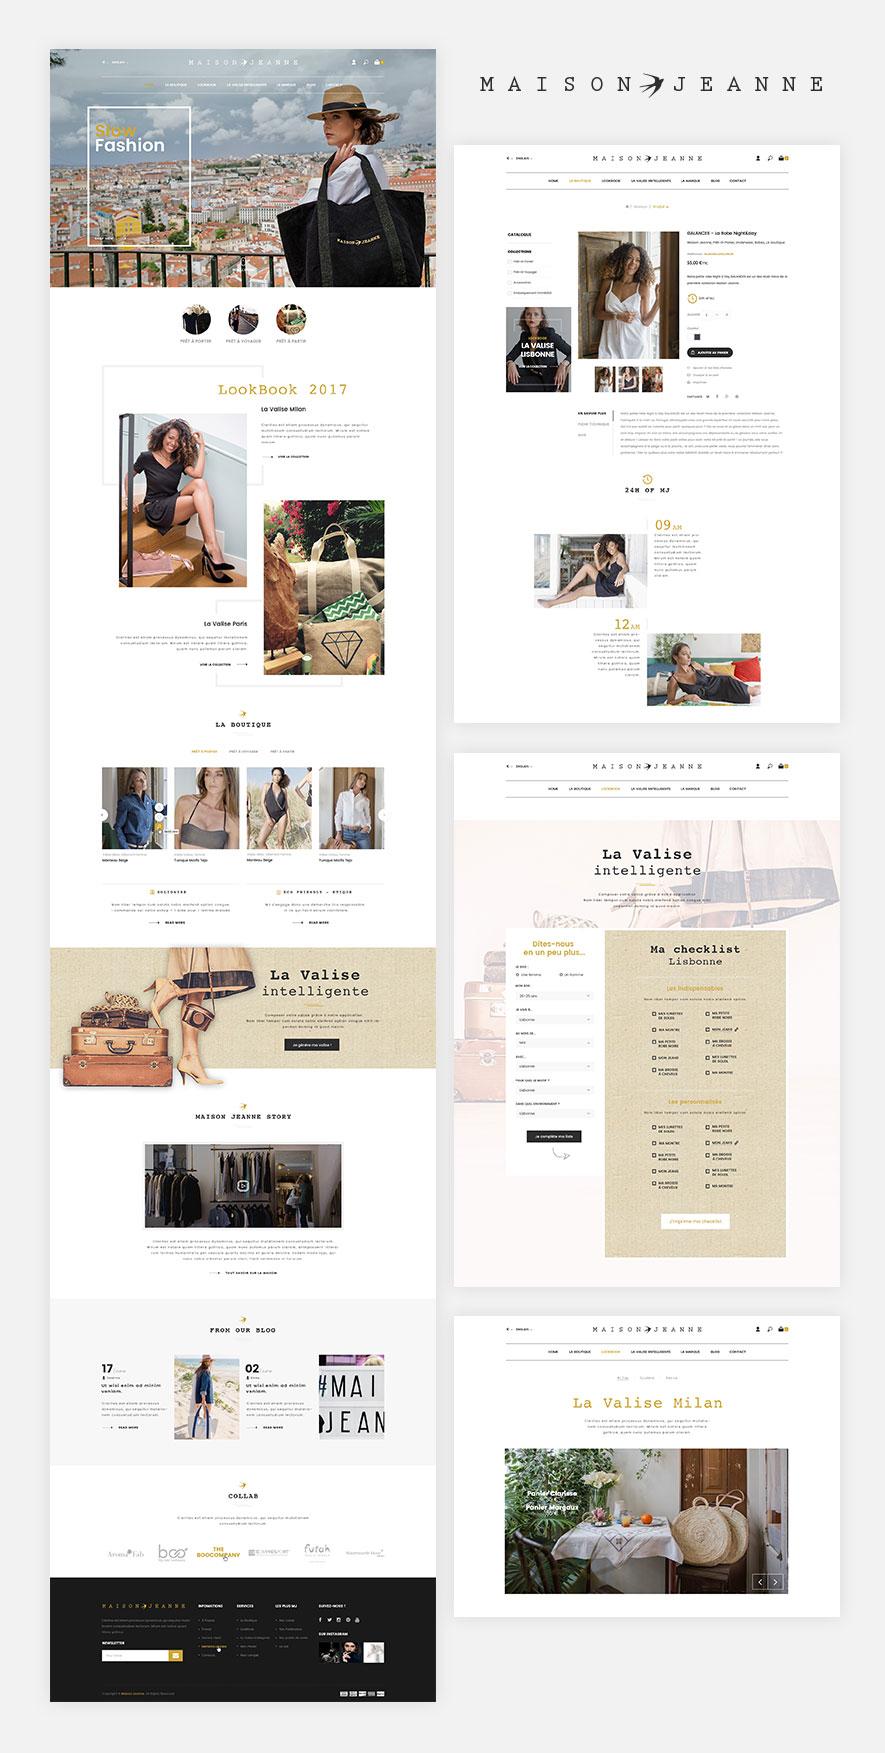 maison jeanne, e-commerce, web design